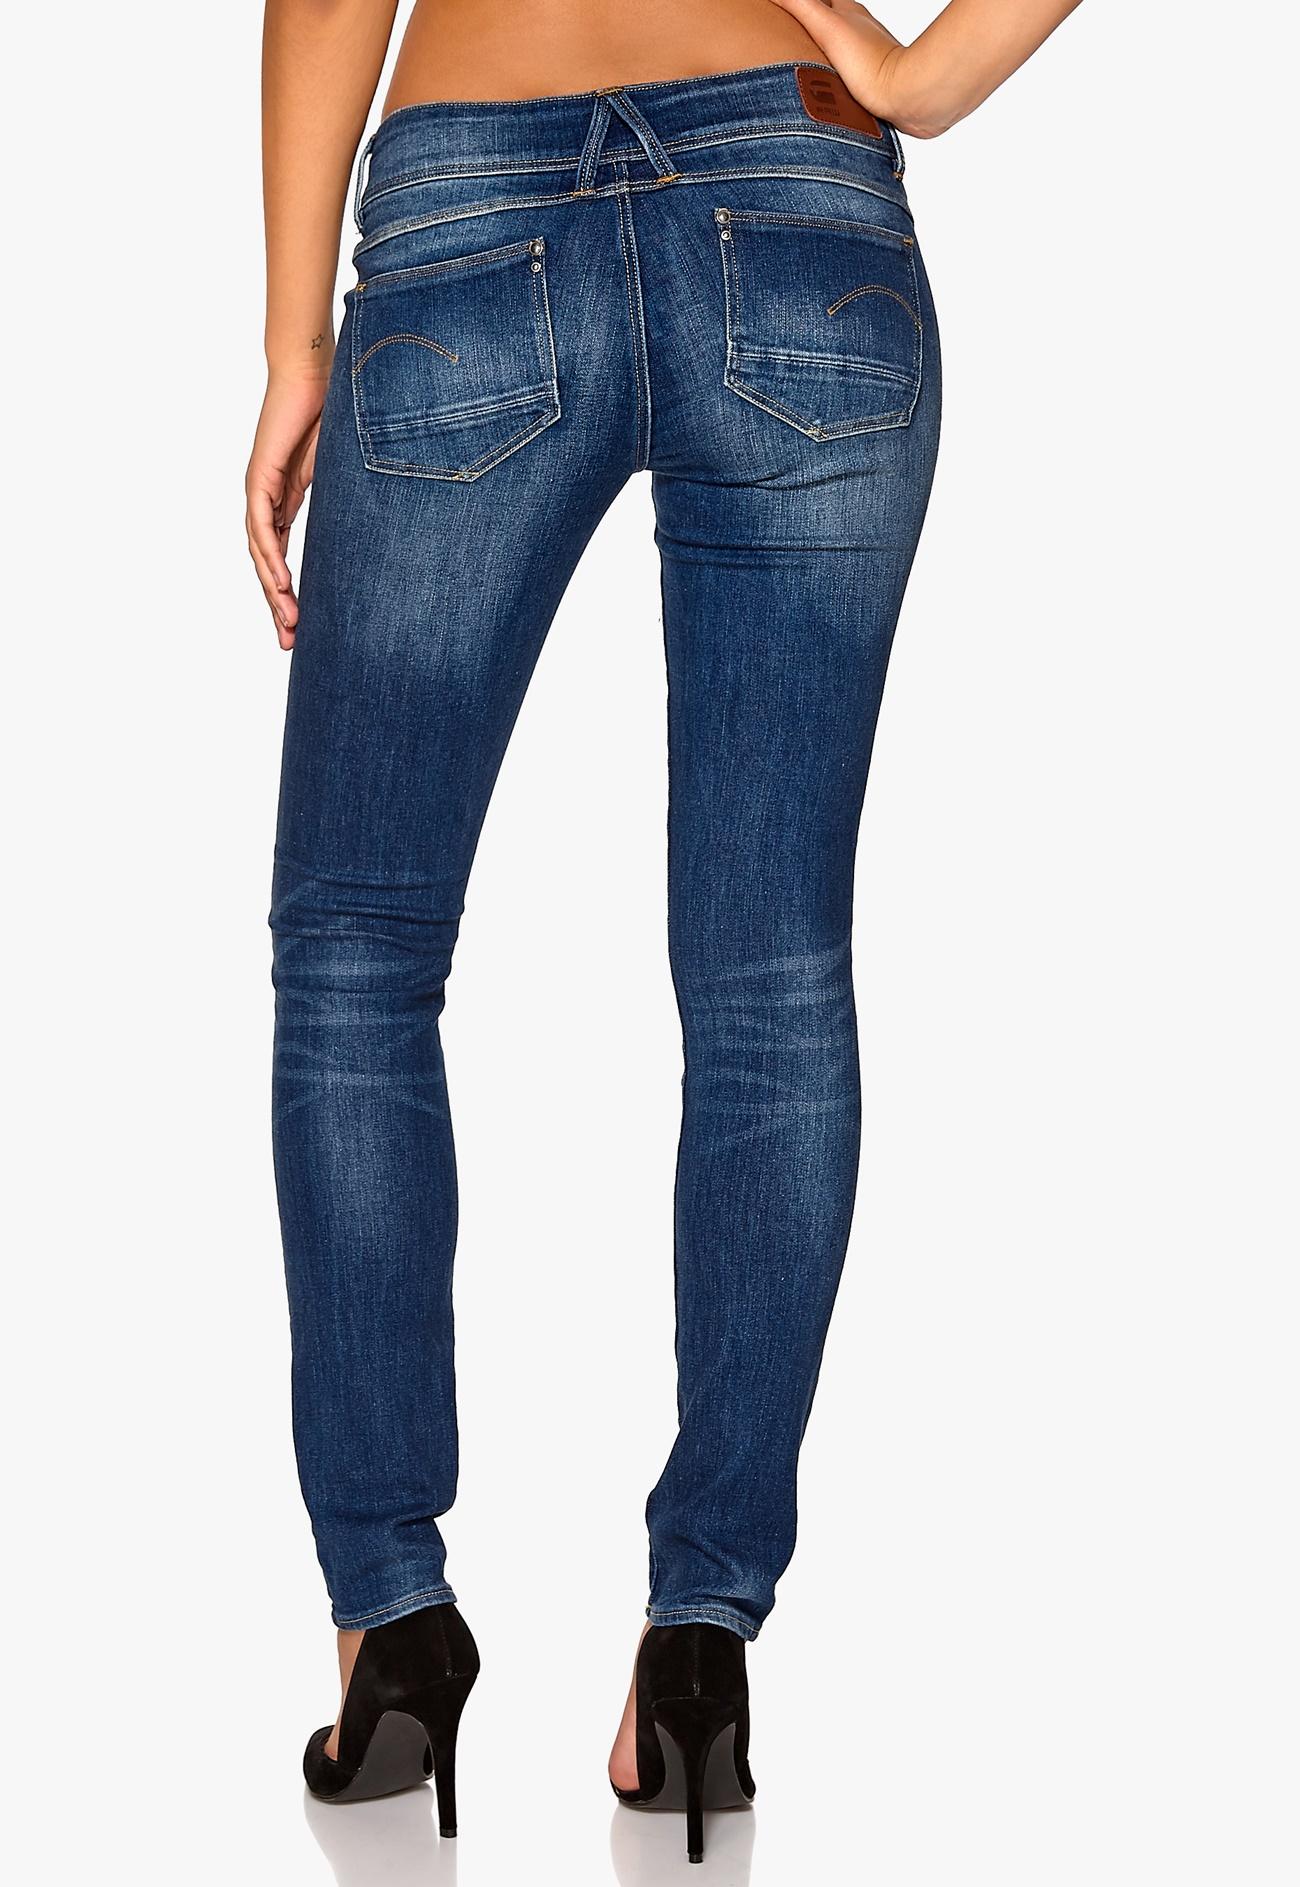 g star lynn mid skinny jeans 424 lt aged bubbleroom. Black Bedroom Furniture Sets. Home Design Ideas